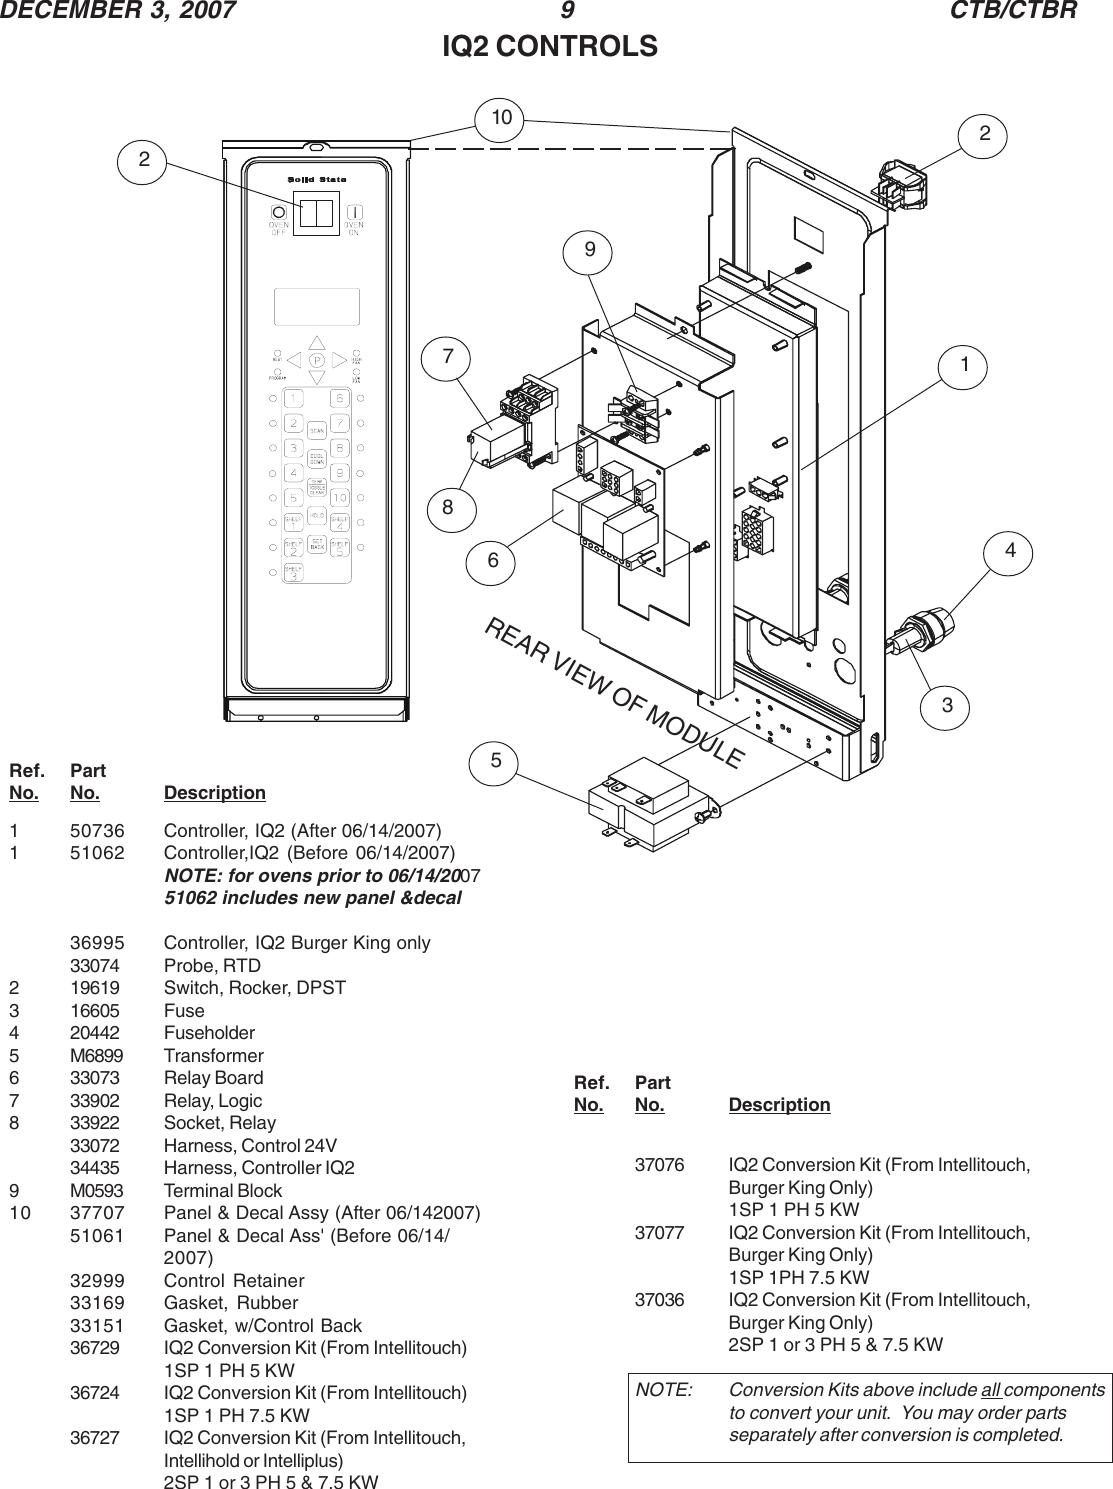 Blodgett Ctb Users Manual Parts